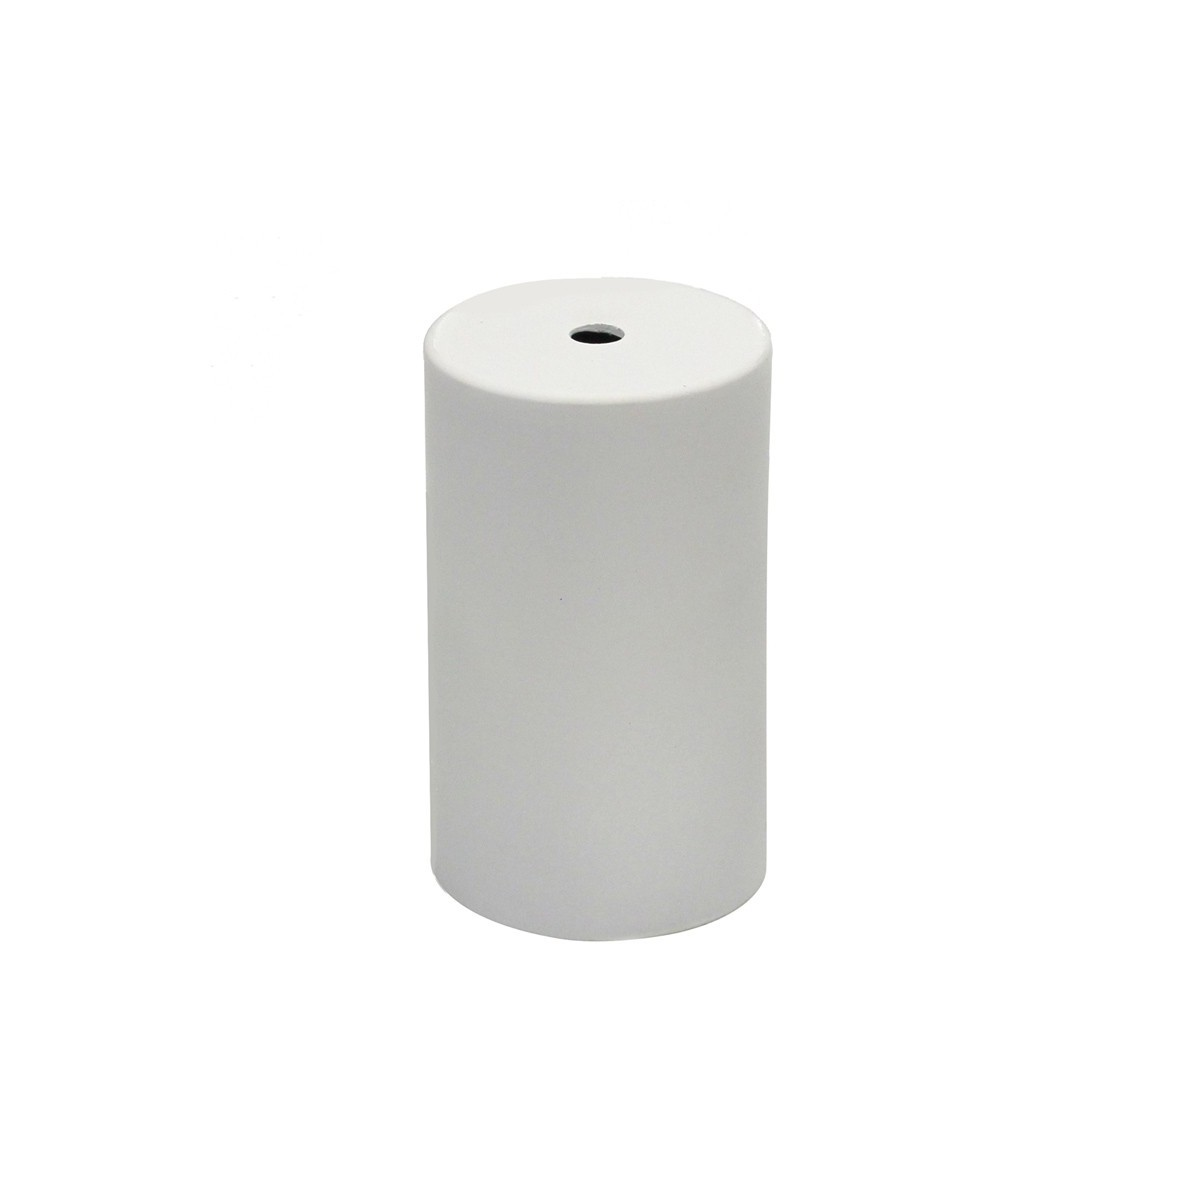 Cilindro Blanco para Colgante Construct Make it